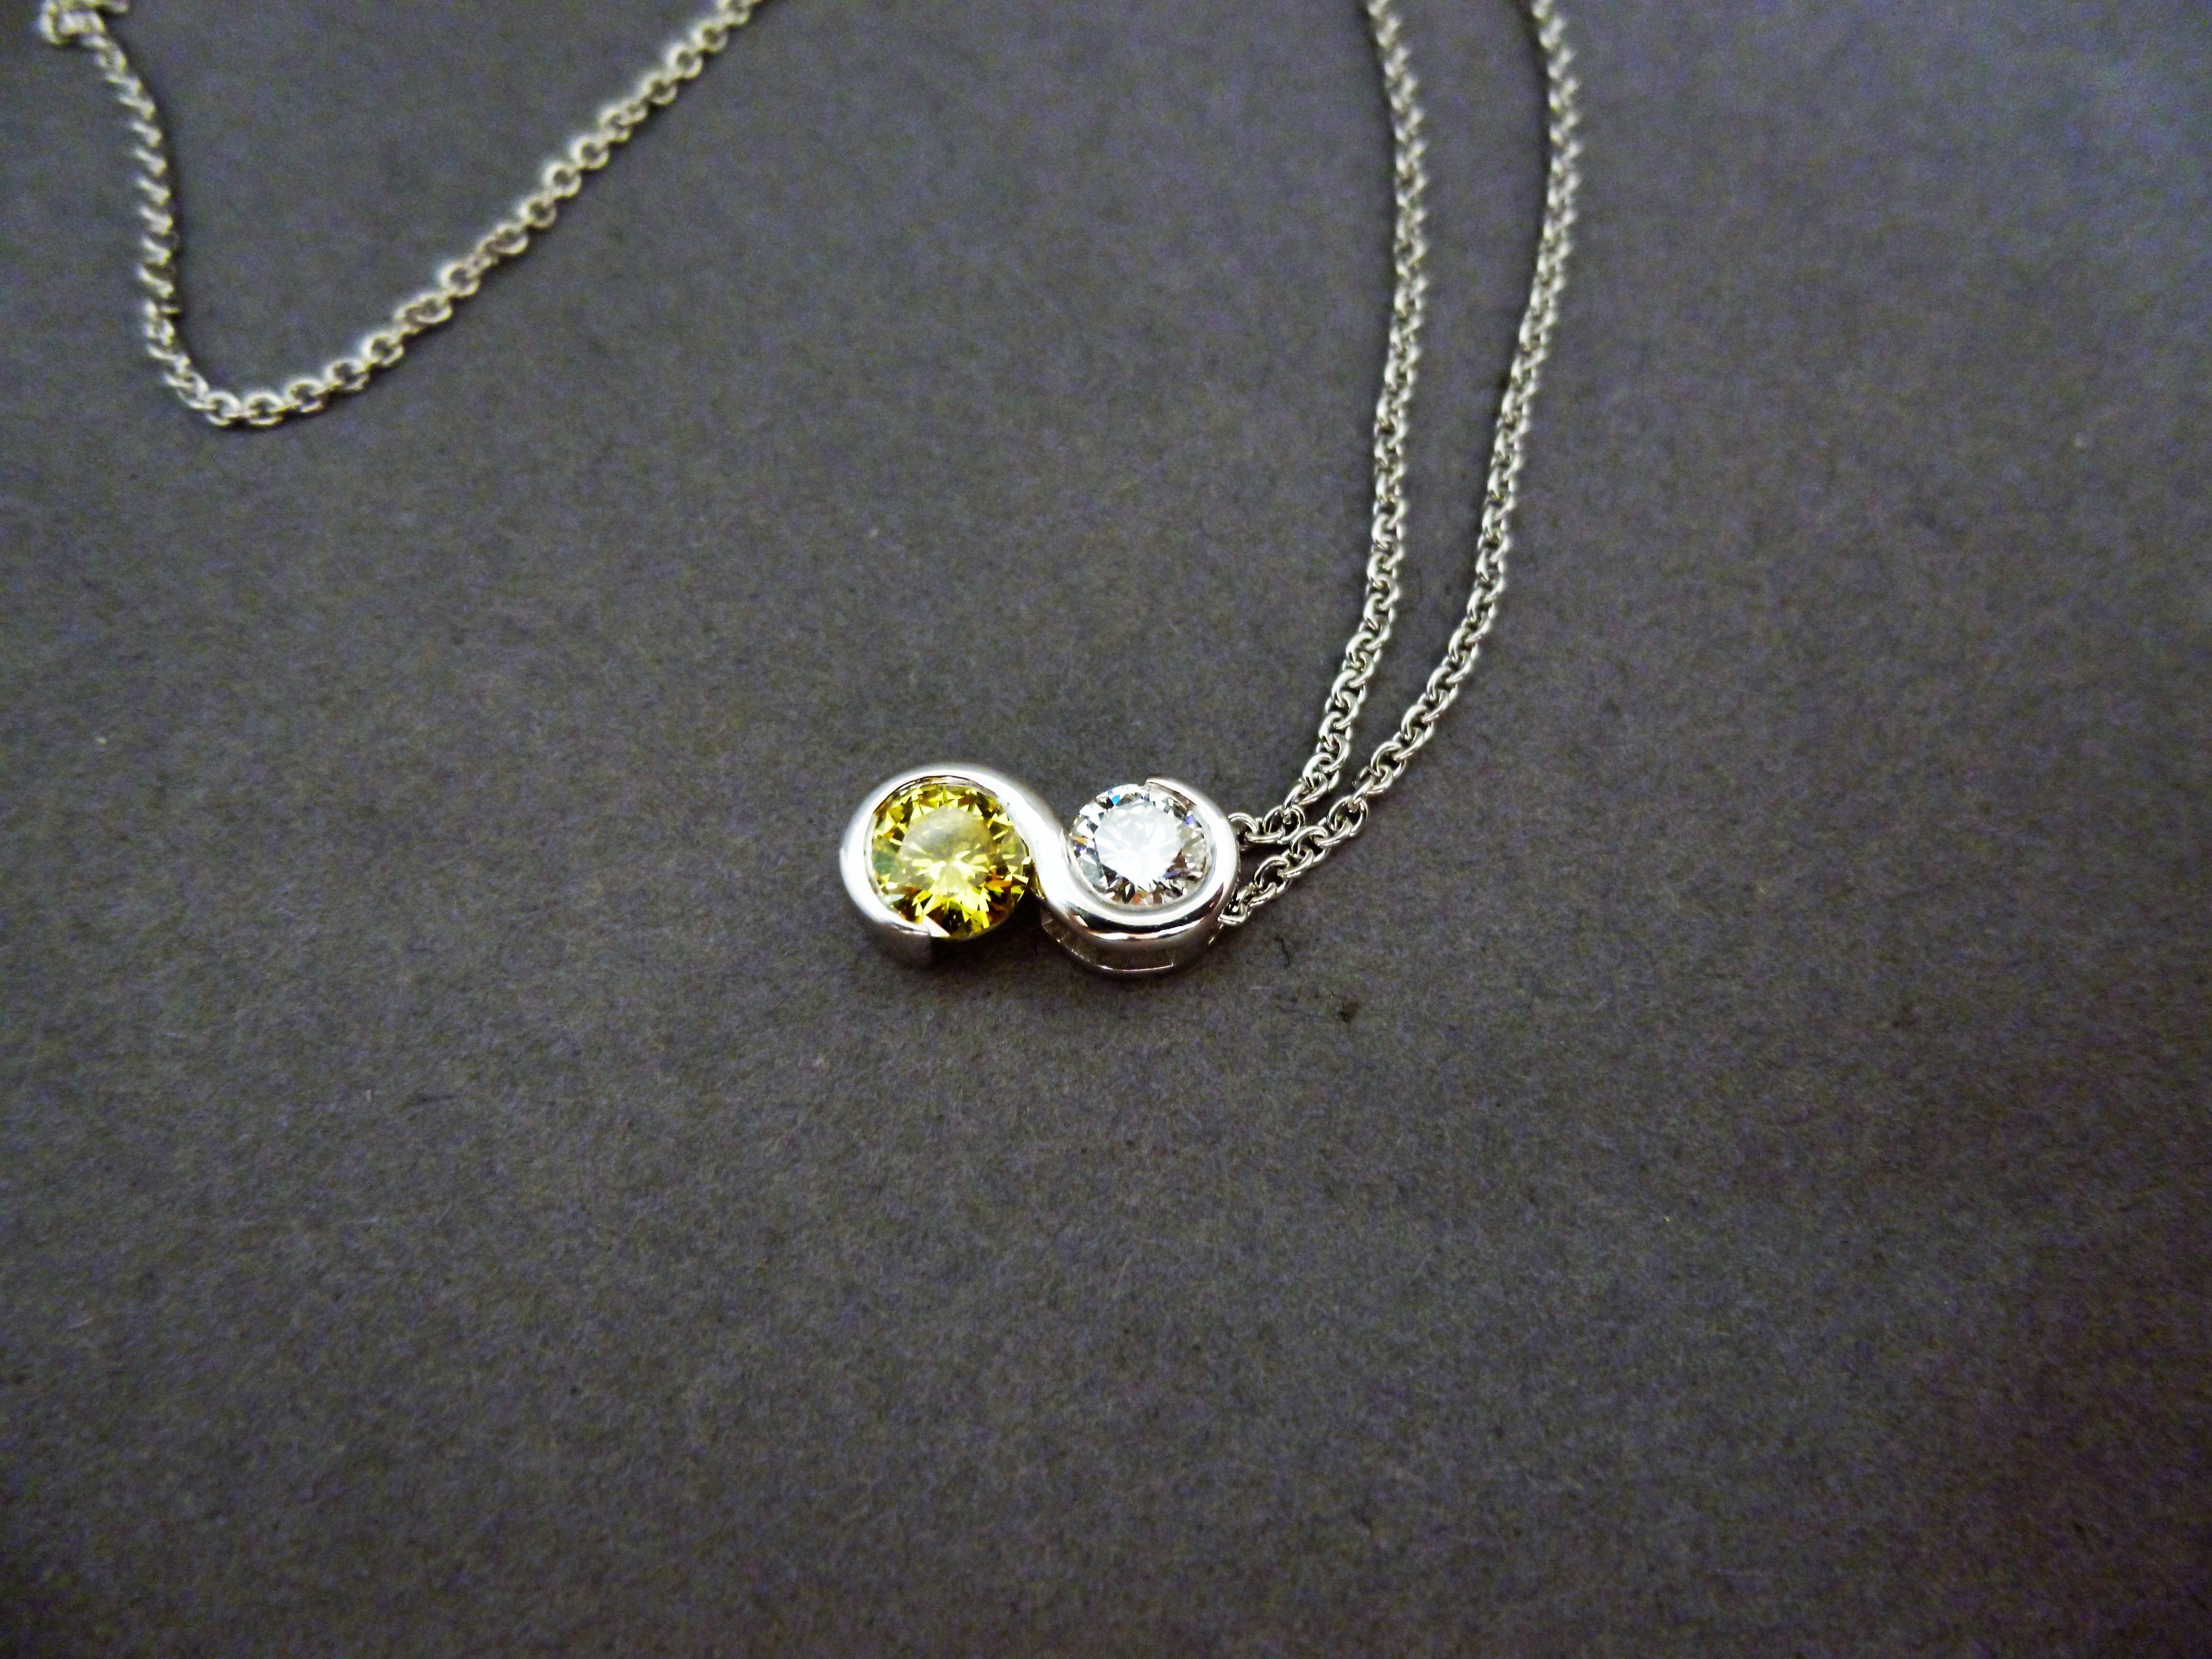 A yellow and white diamond pendant laid down